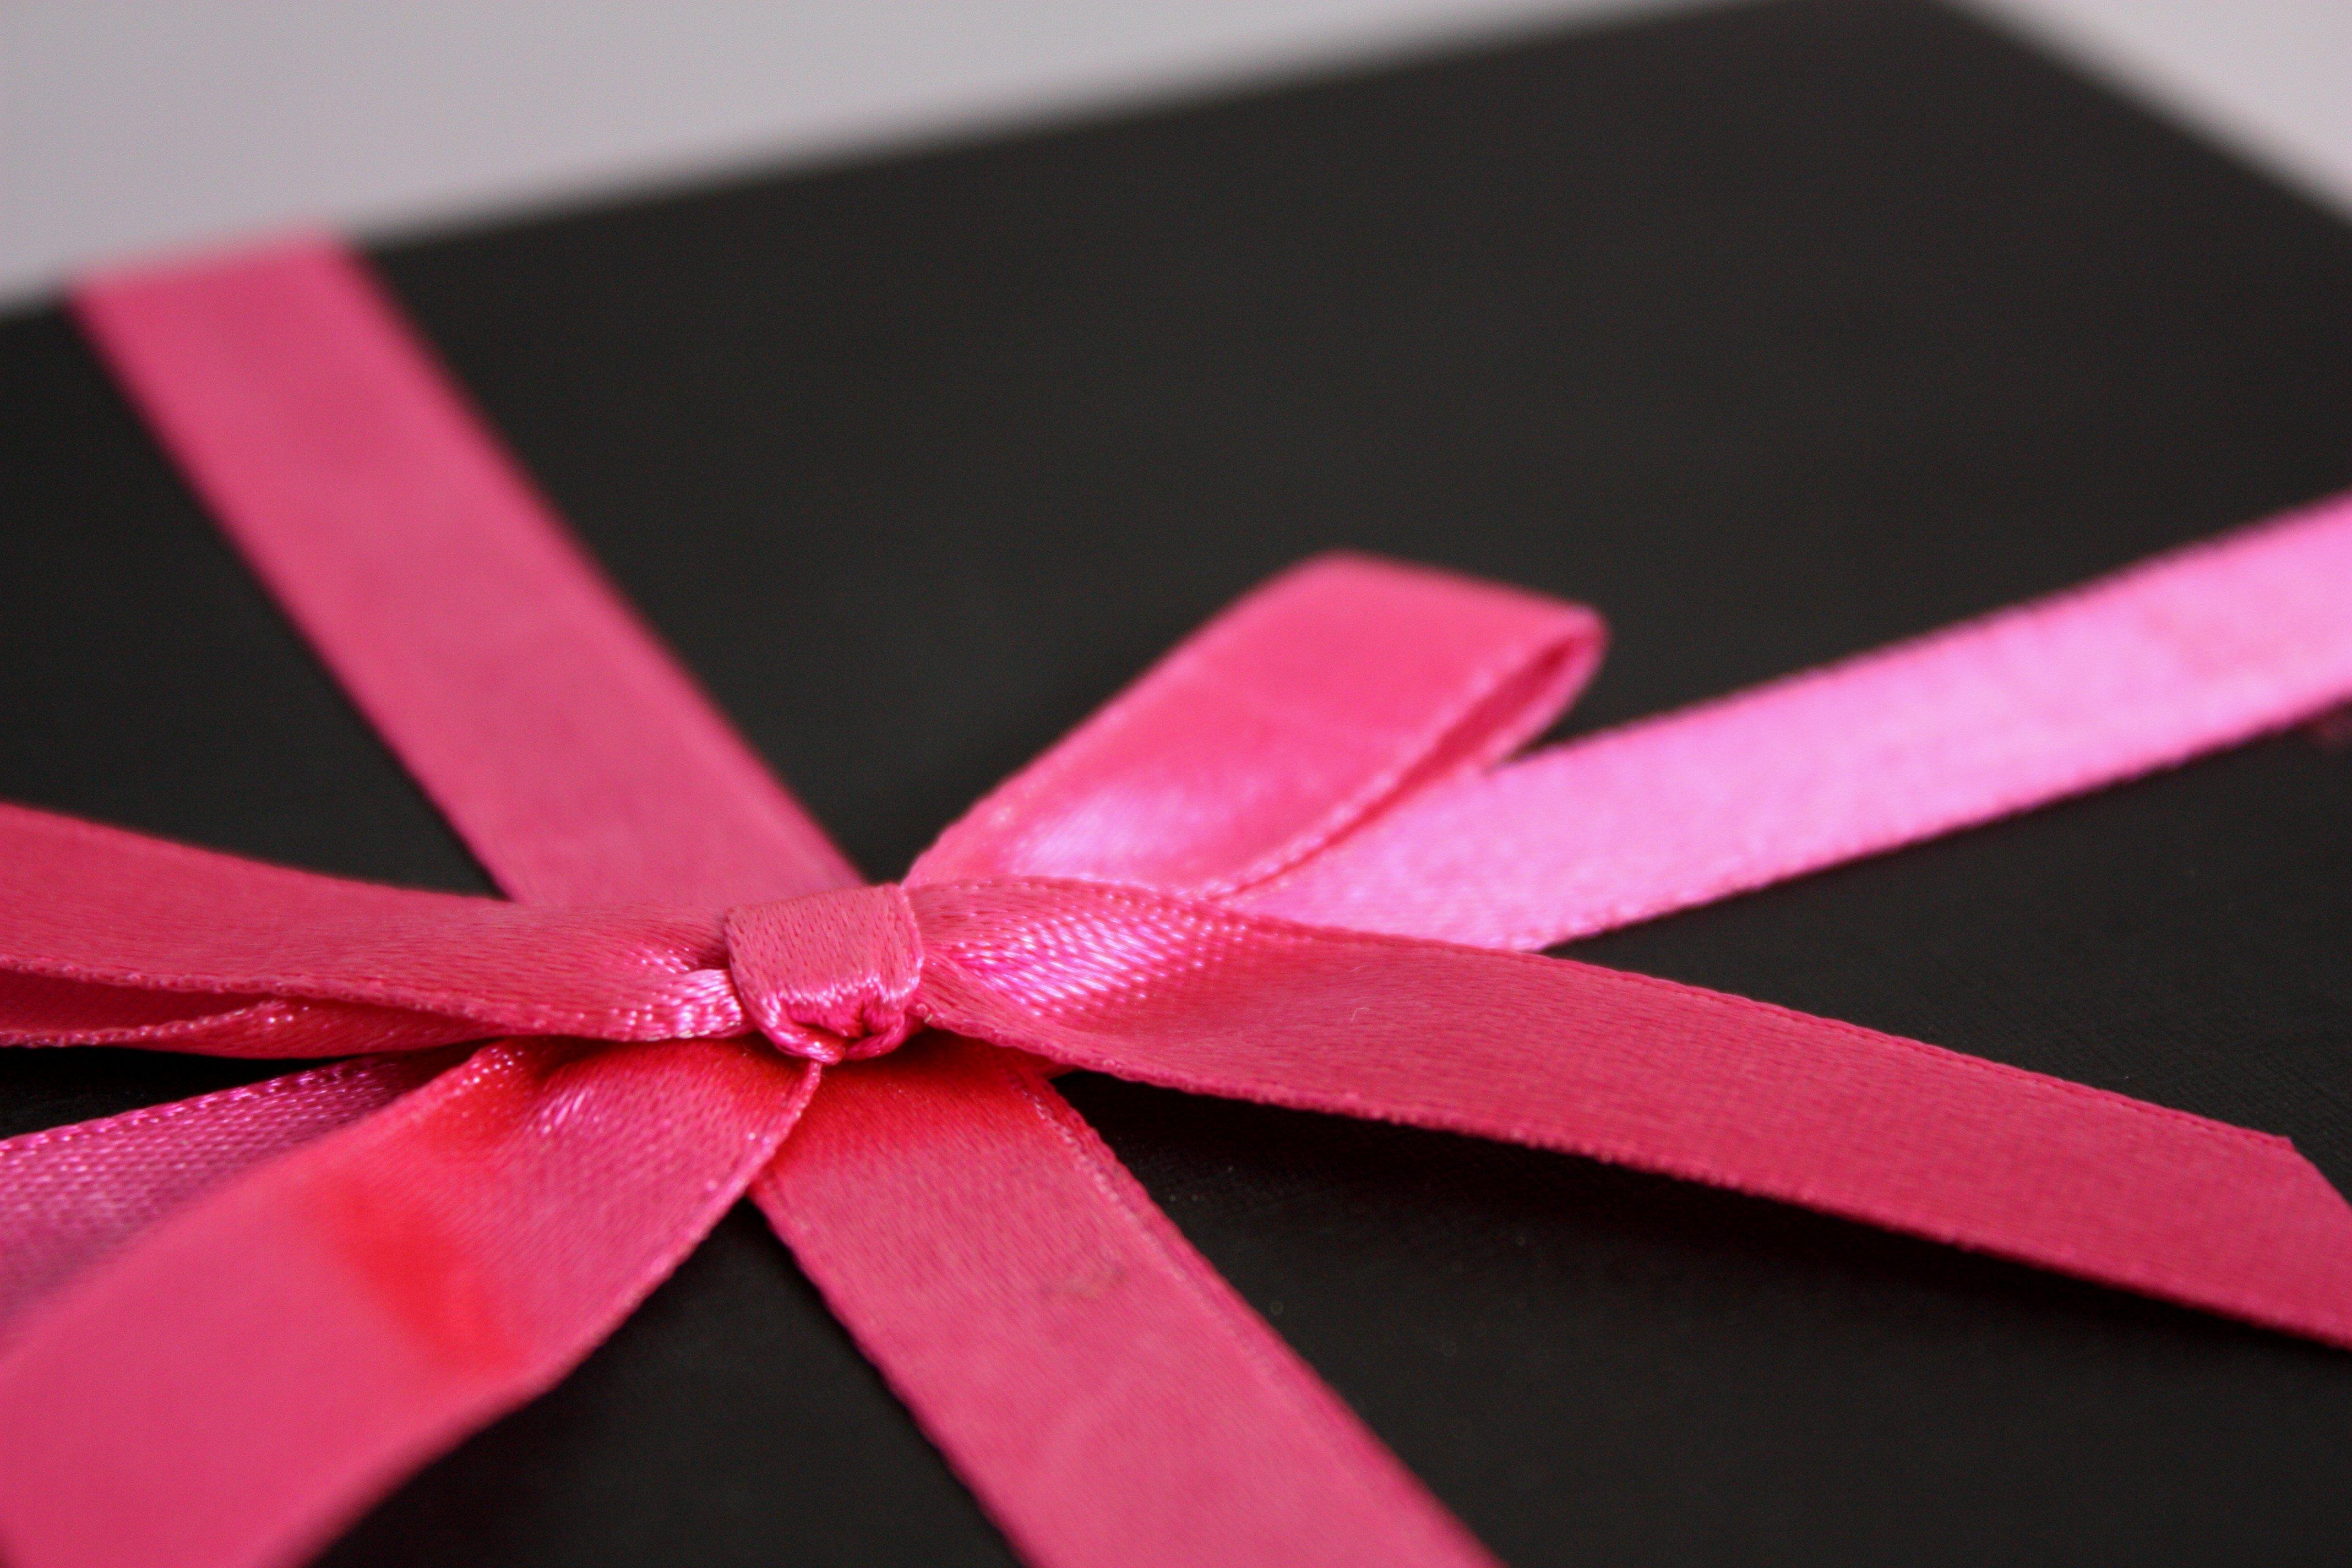 Free Images : flower, petal, celebration, gift, red, box, shopping ...